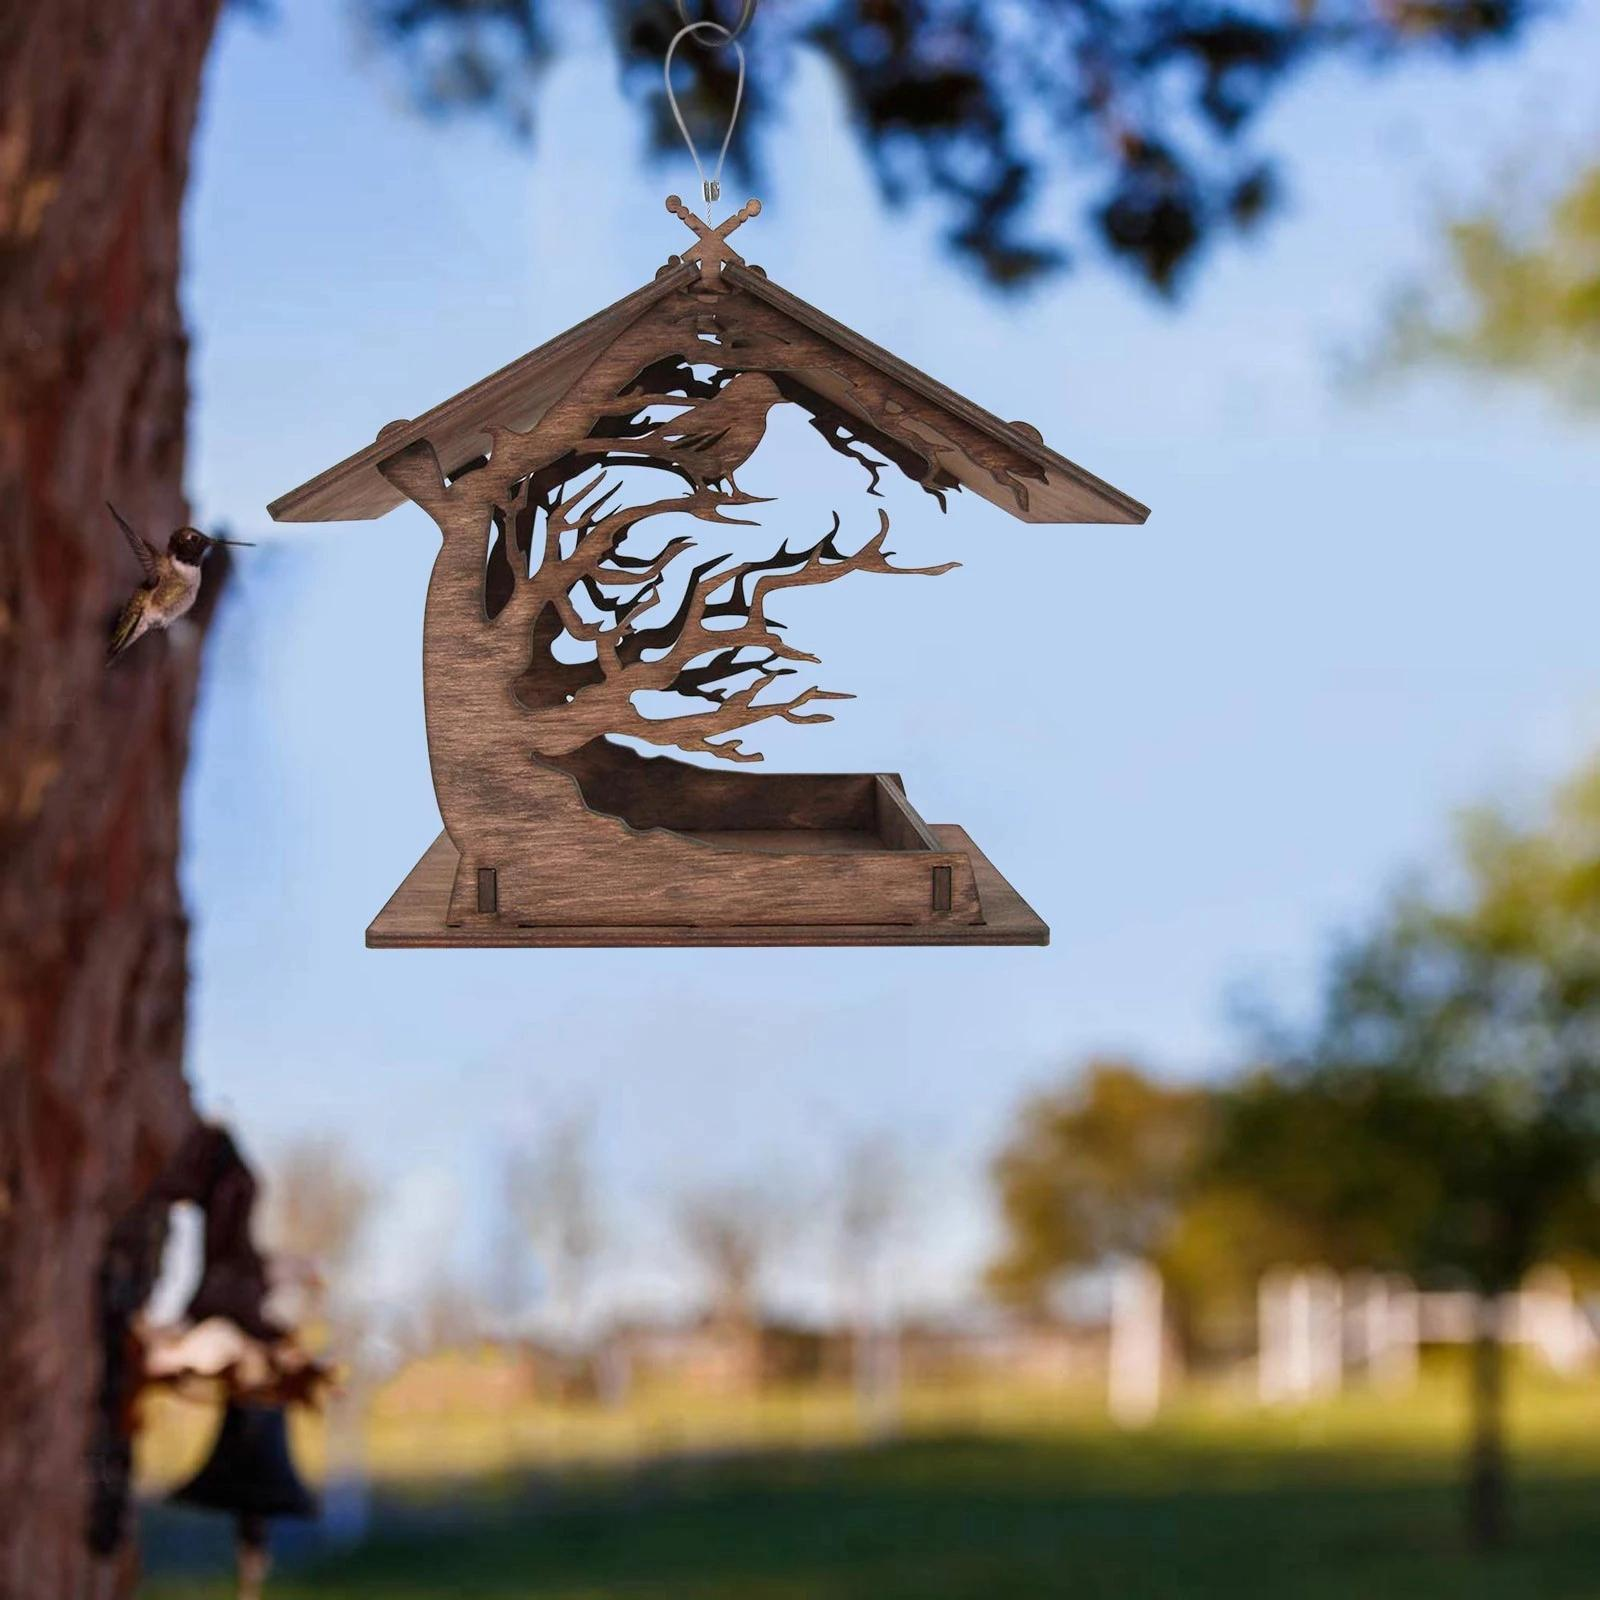 thumbnail 7 - Wooden Bird Feeder Balcony Ranch Decoration Ornaments Wildbird Essentials